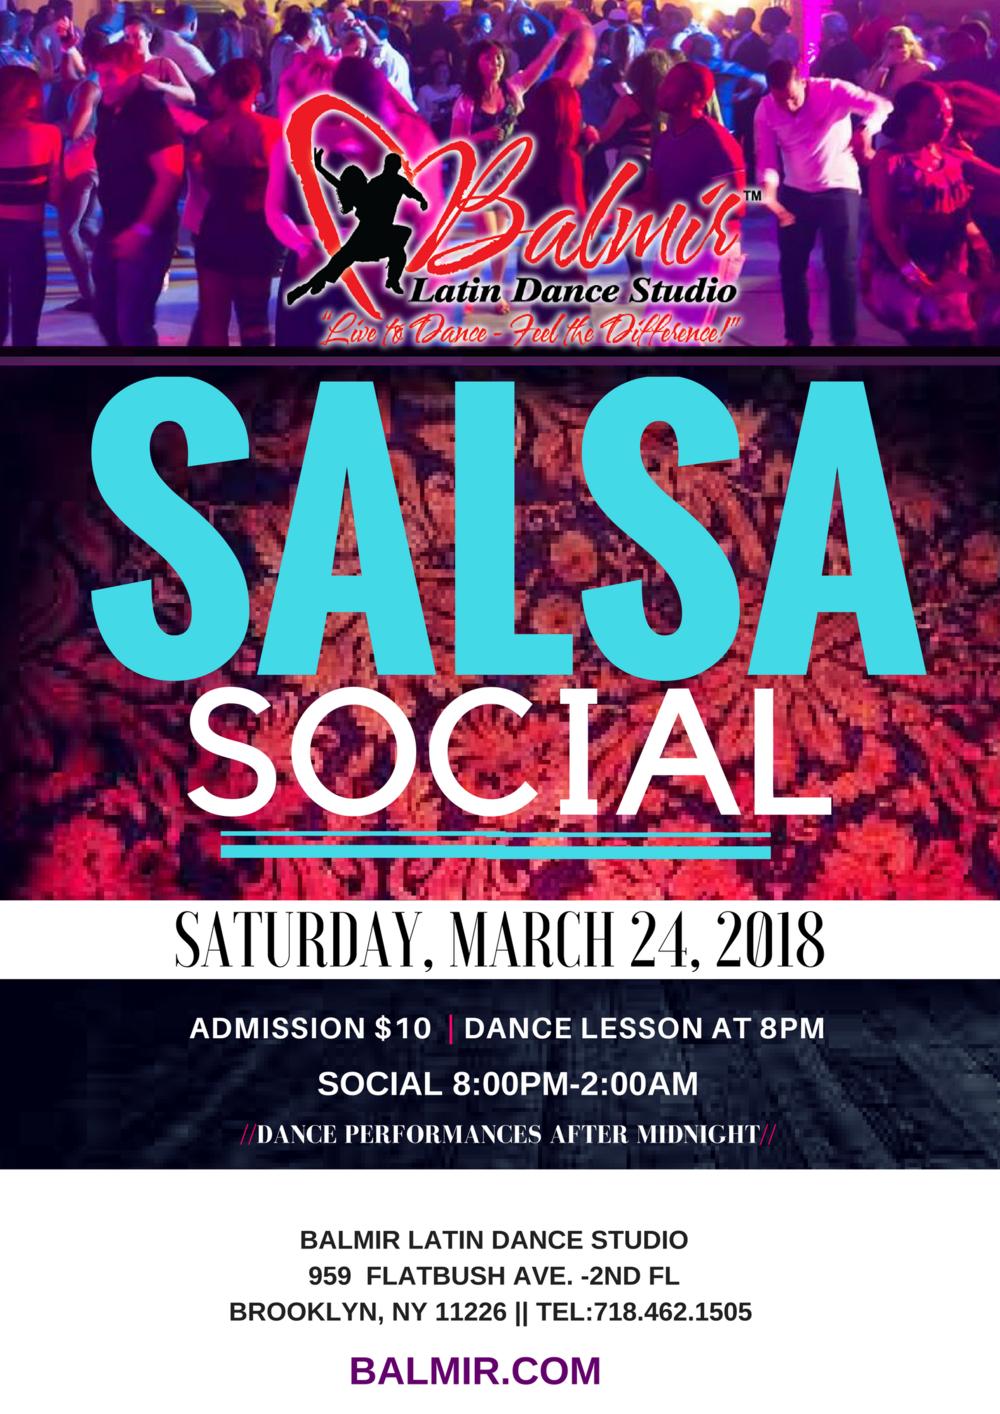 Salsa Social Dance Party at Balmir Latin Dance Studio in Brooklyn NY Saturday March 24, 2018